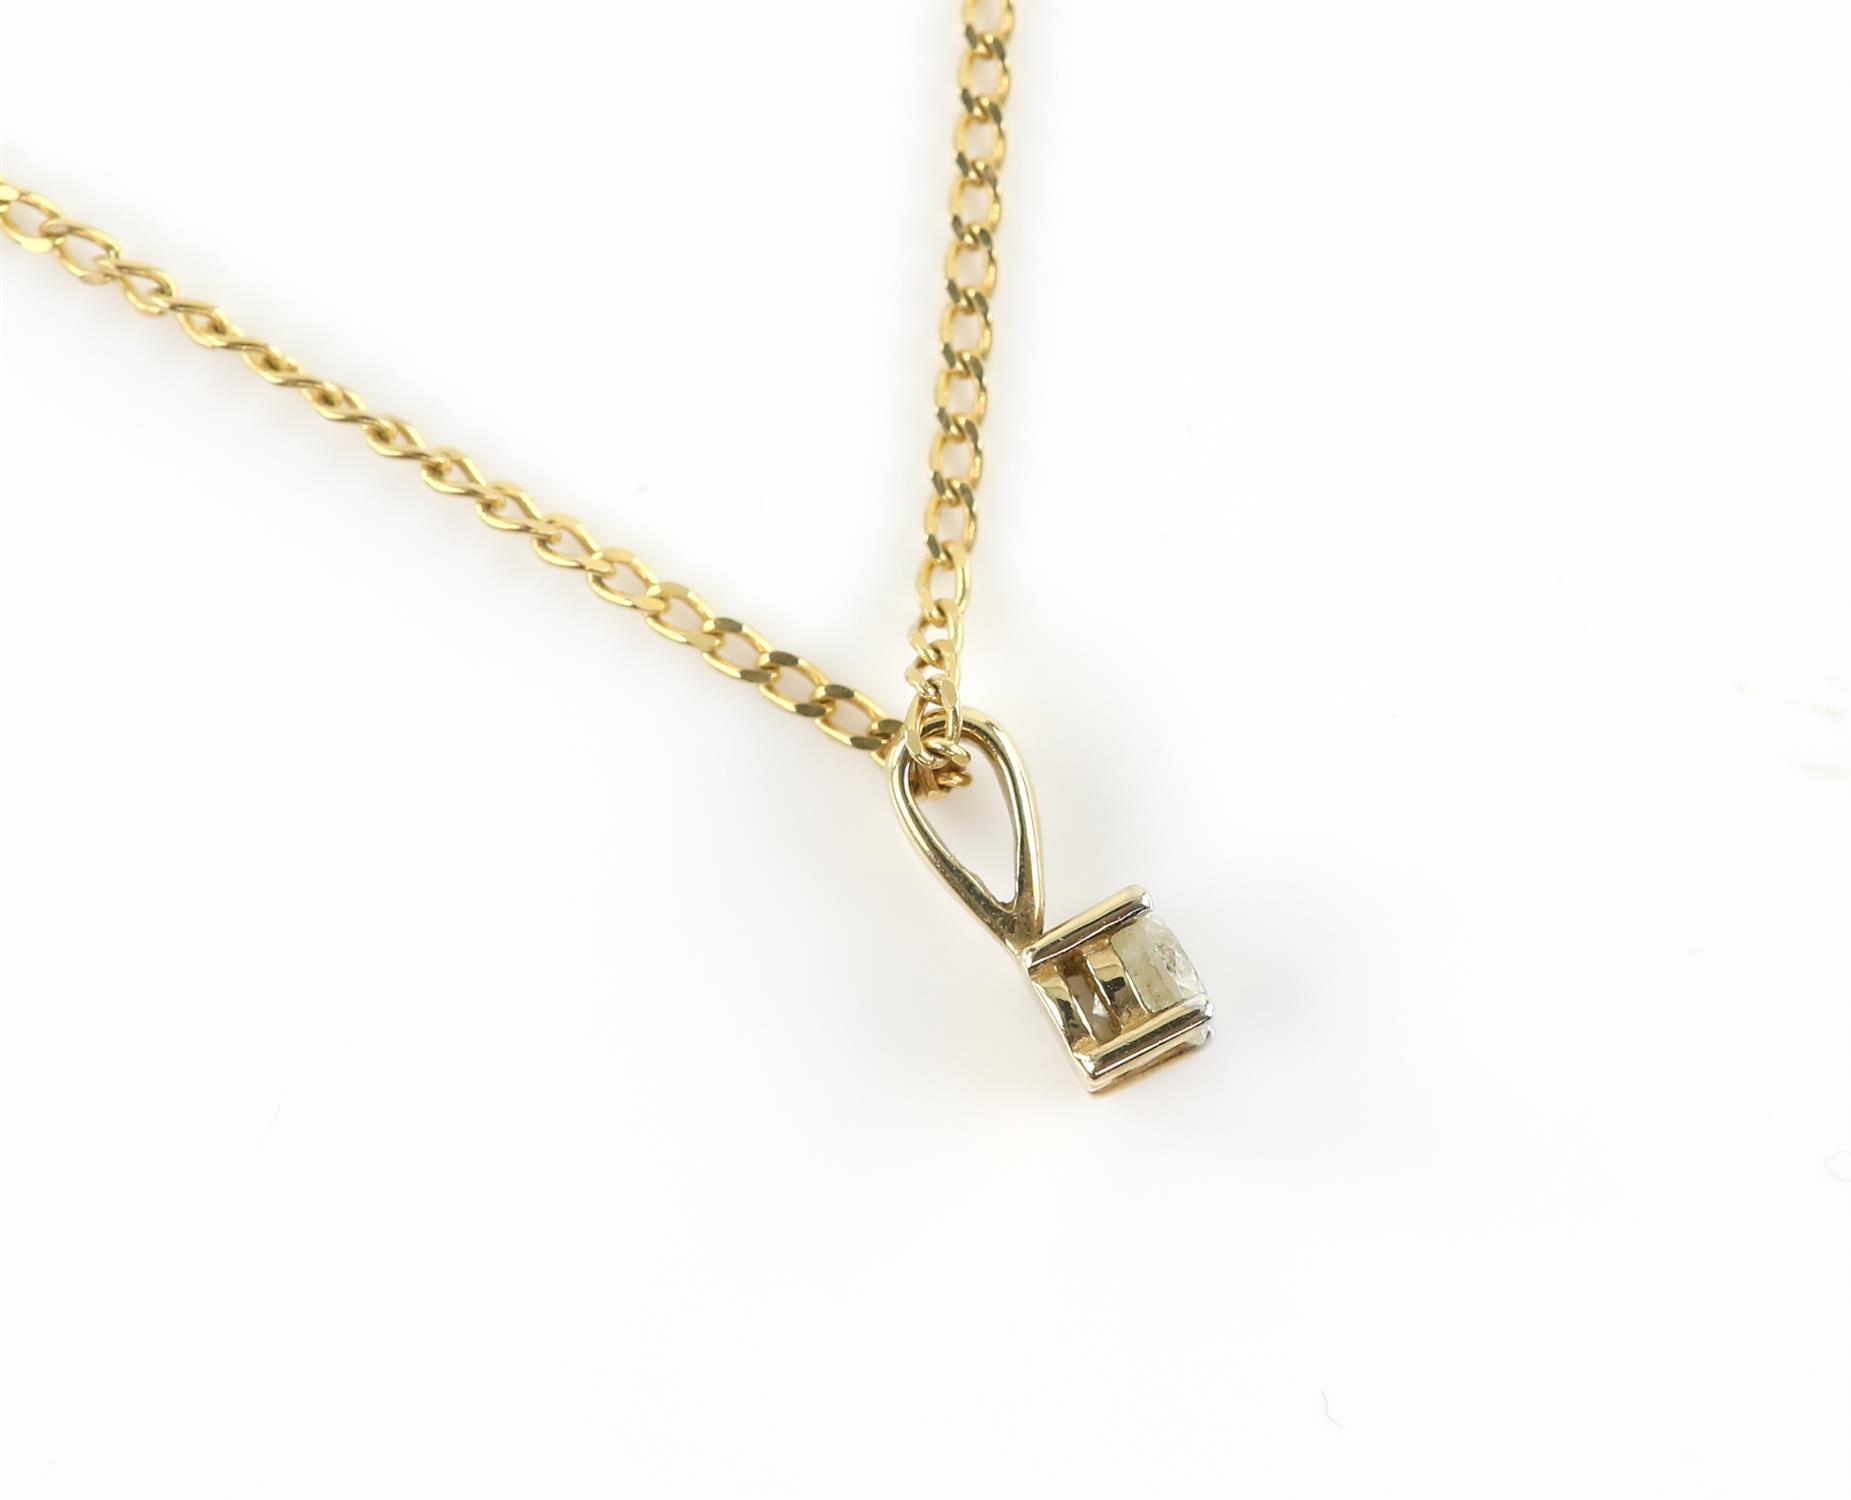 Single stone diamond pendant, round brilliant cut diamond weighing an estimated 0.23 carat, - Image 2 of 2